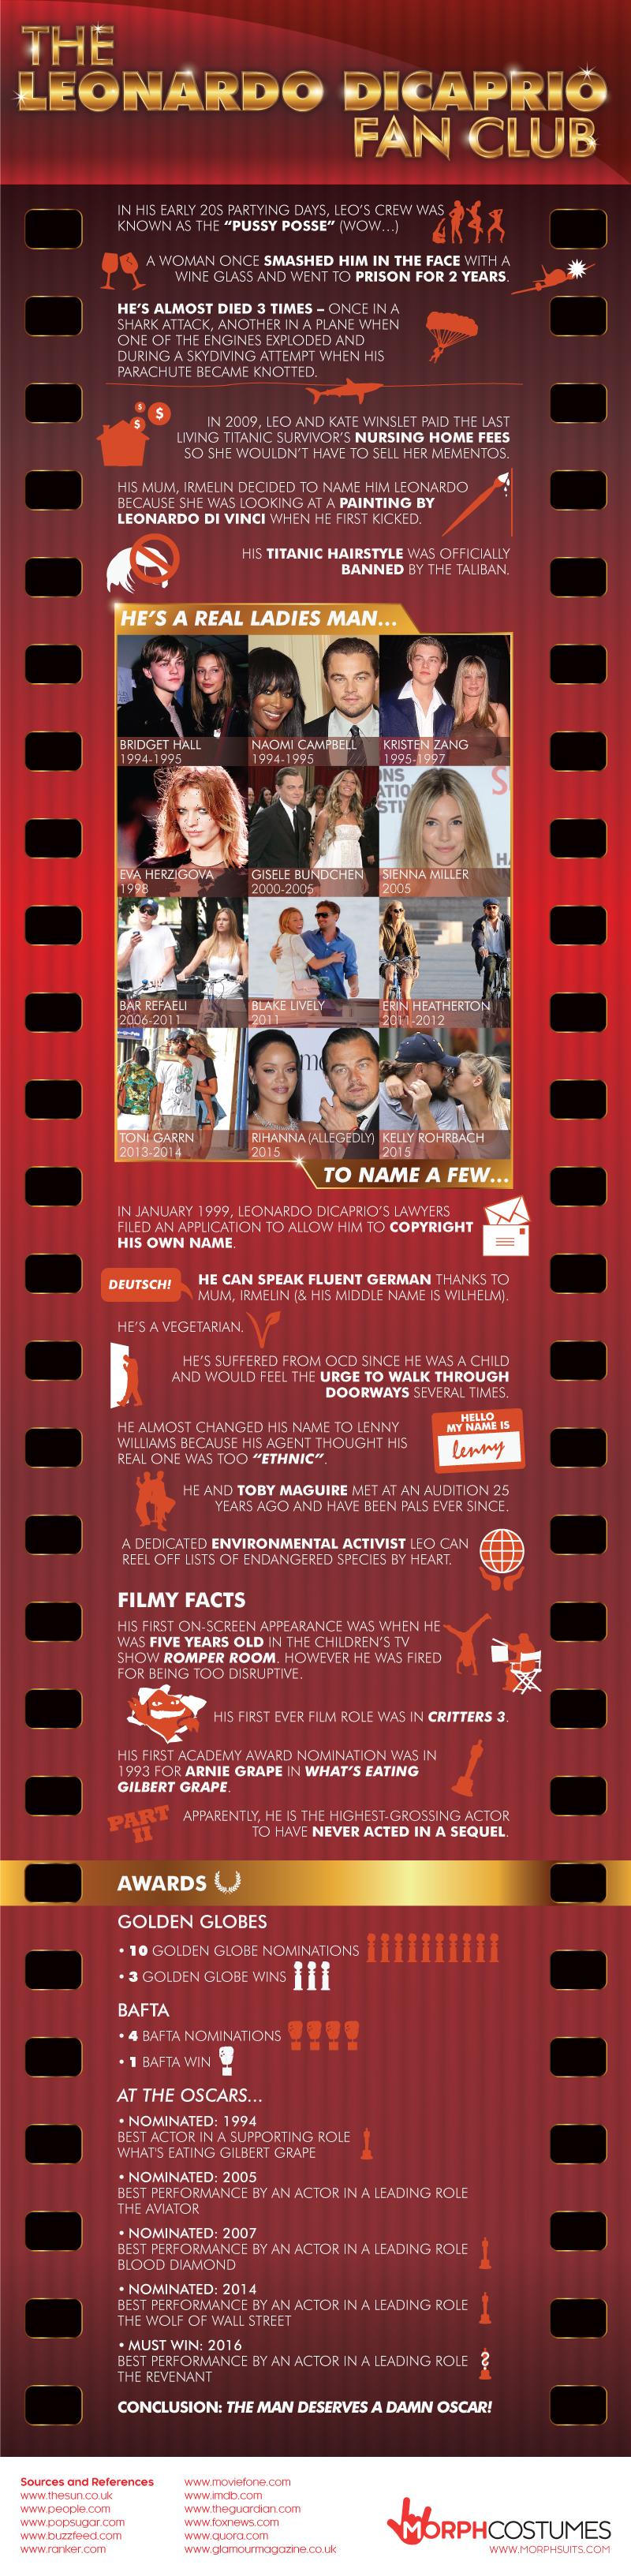 The-Leonardo-DiCaprio-Fan-Club-Infographic